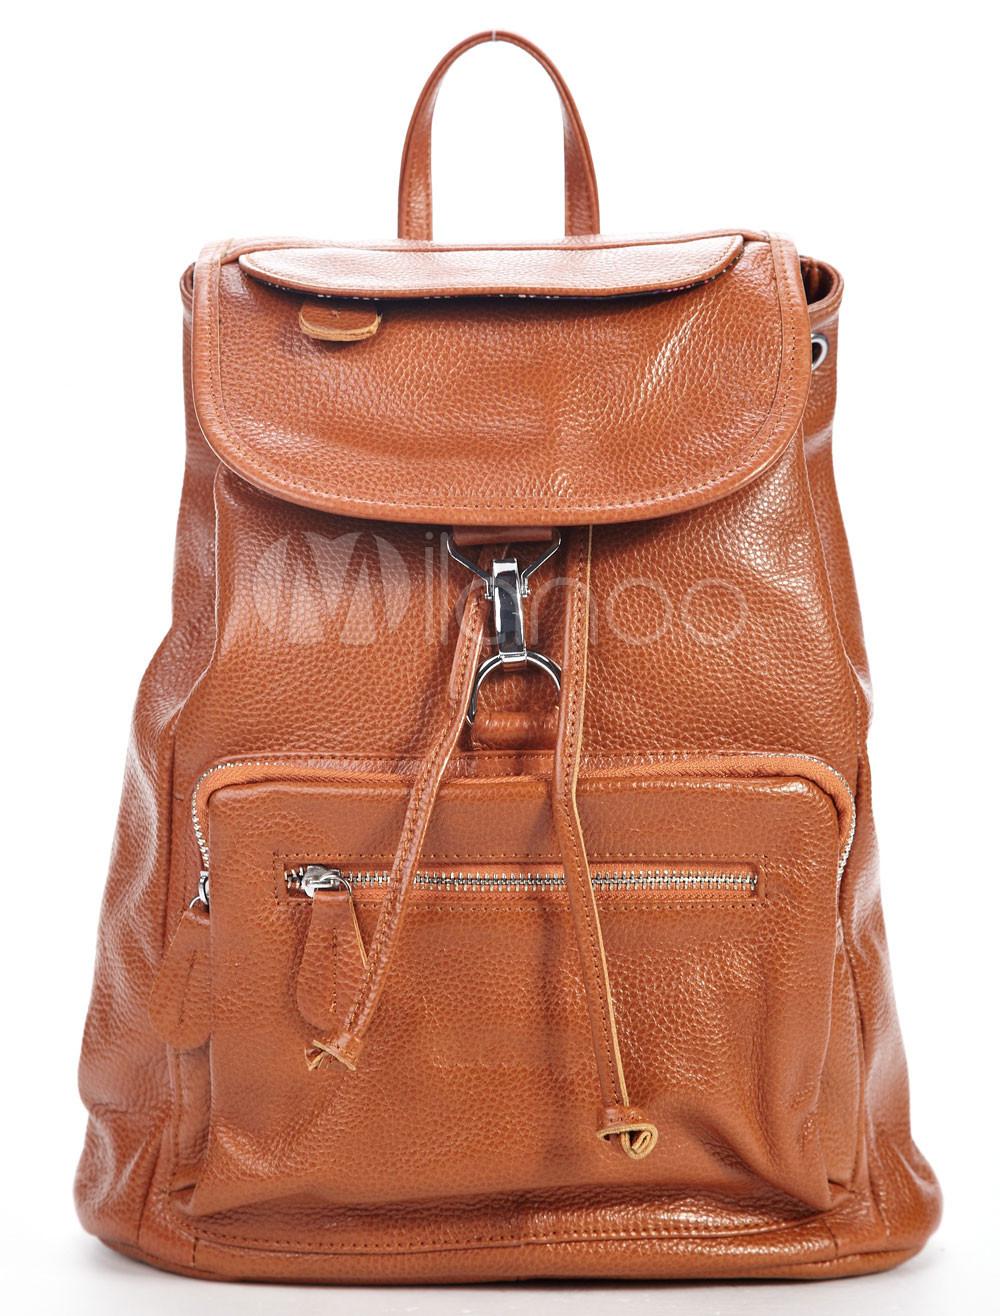 Glamorous Wheat Cowhide 33*13*35cm Satchel Handbag For Ladies